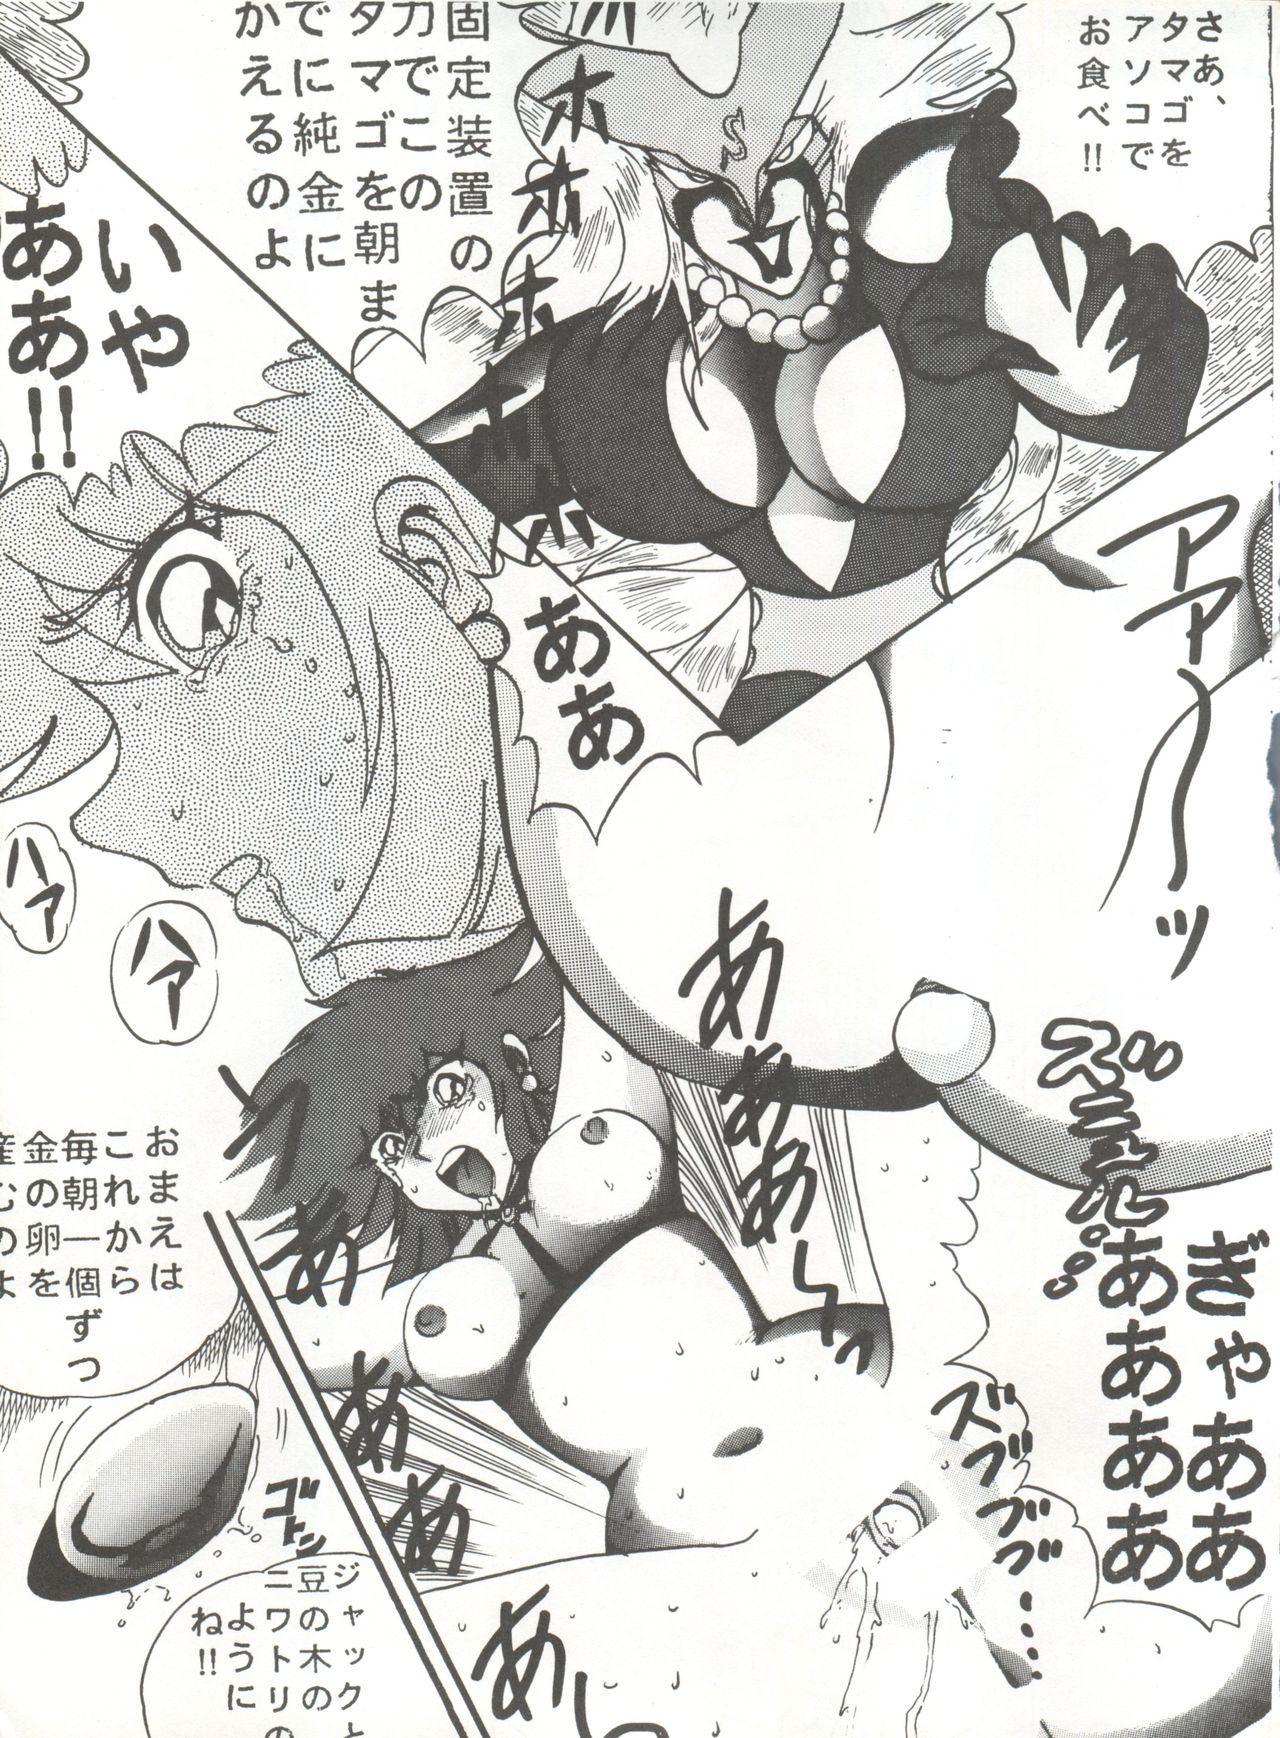 [Global One (MARO)] Sadistic 5 (Cutey Honey, Devilman, Sailor Moon), [Global One (MARO)] Sadistic (Dirty Pair, Fushigi no Umi no Nadia, Sailor Moon), [Studio Ikkatsumajin] .ribbon (Hime-chan's Ribbon) 30